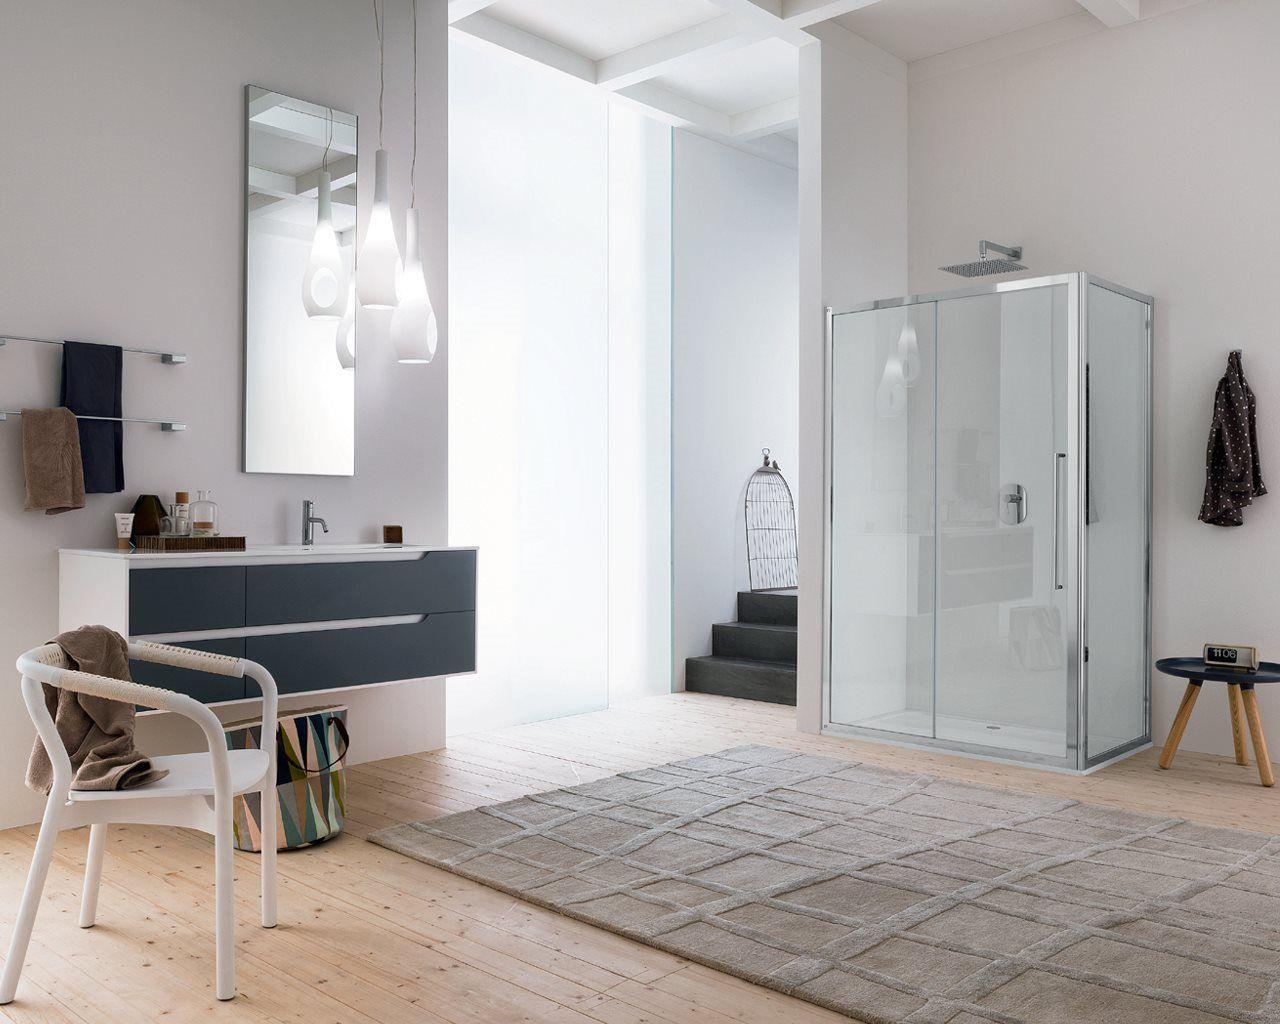 Parete doccia TRENDY DESIGN Inda Arredamento bagno